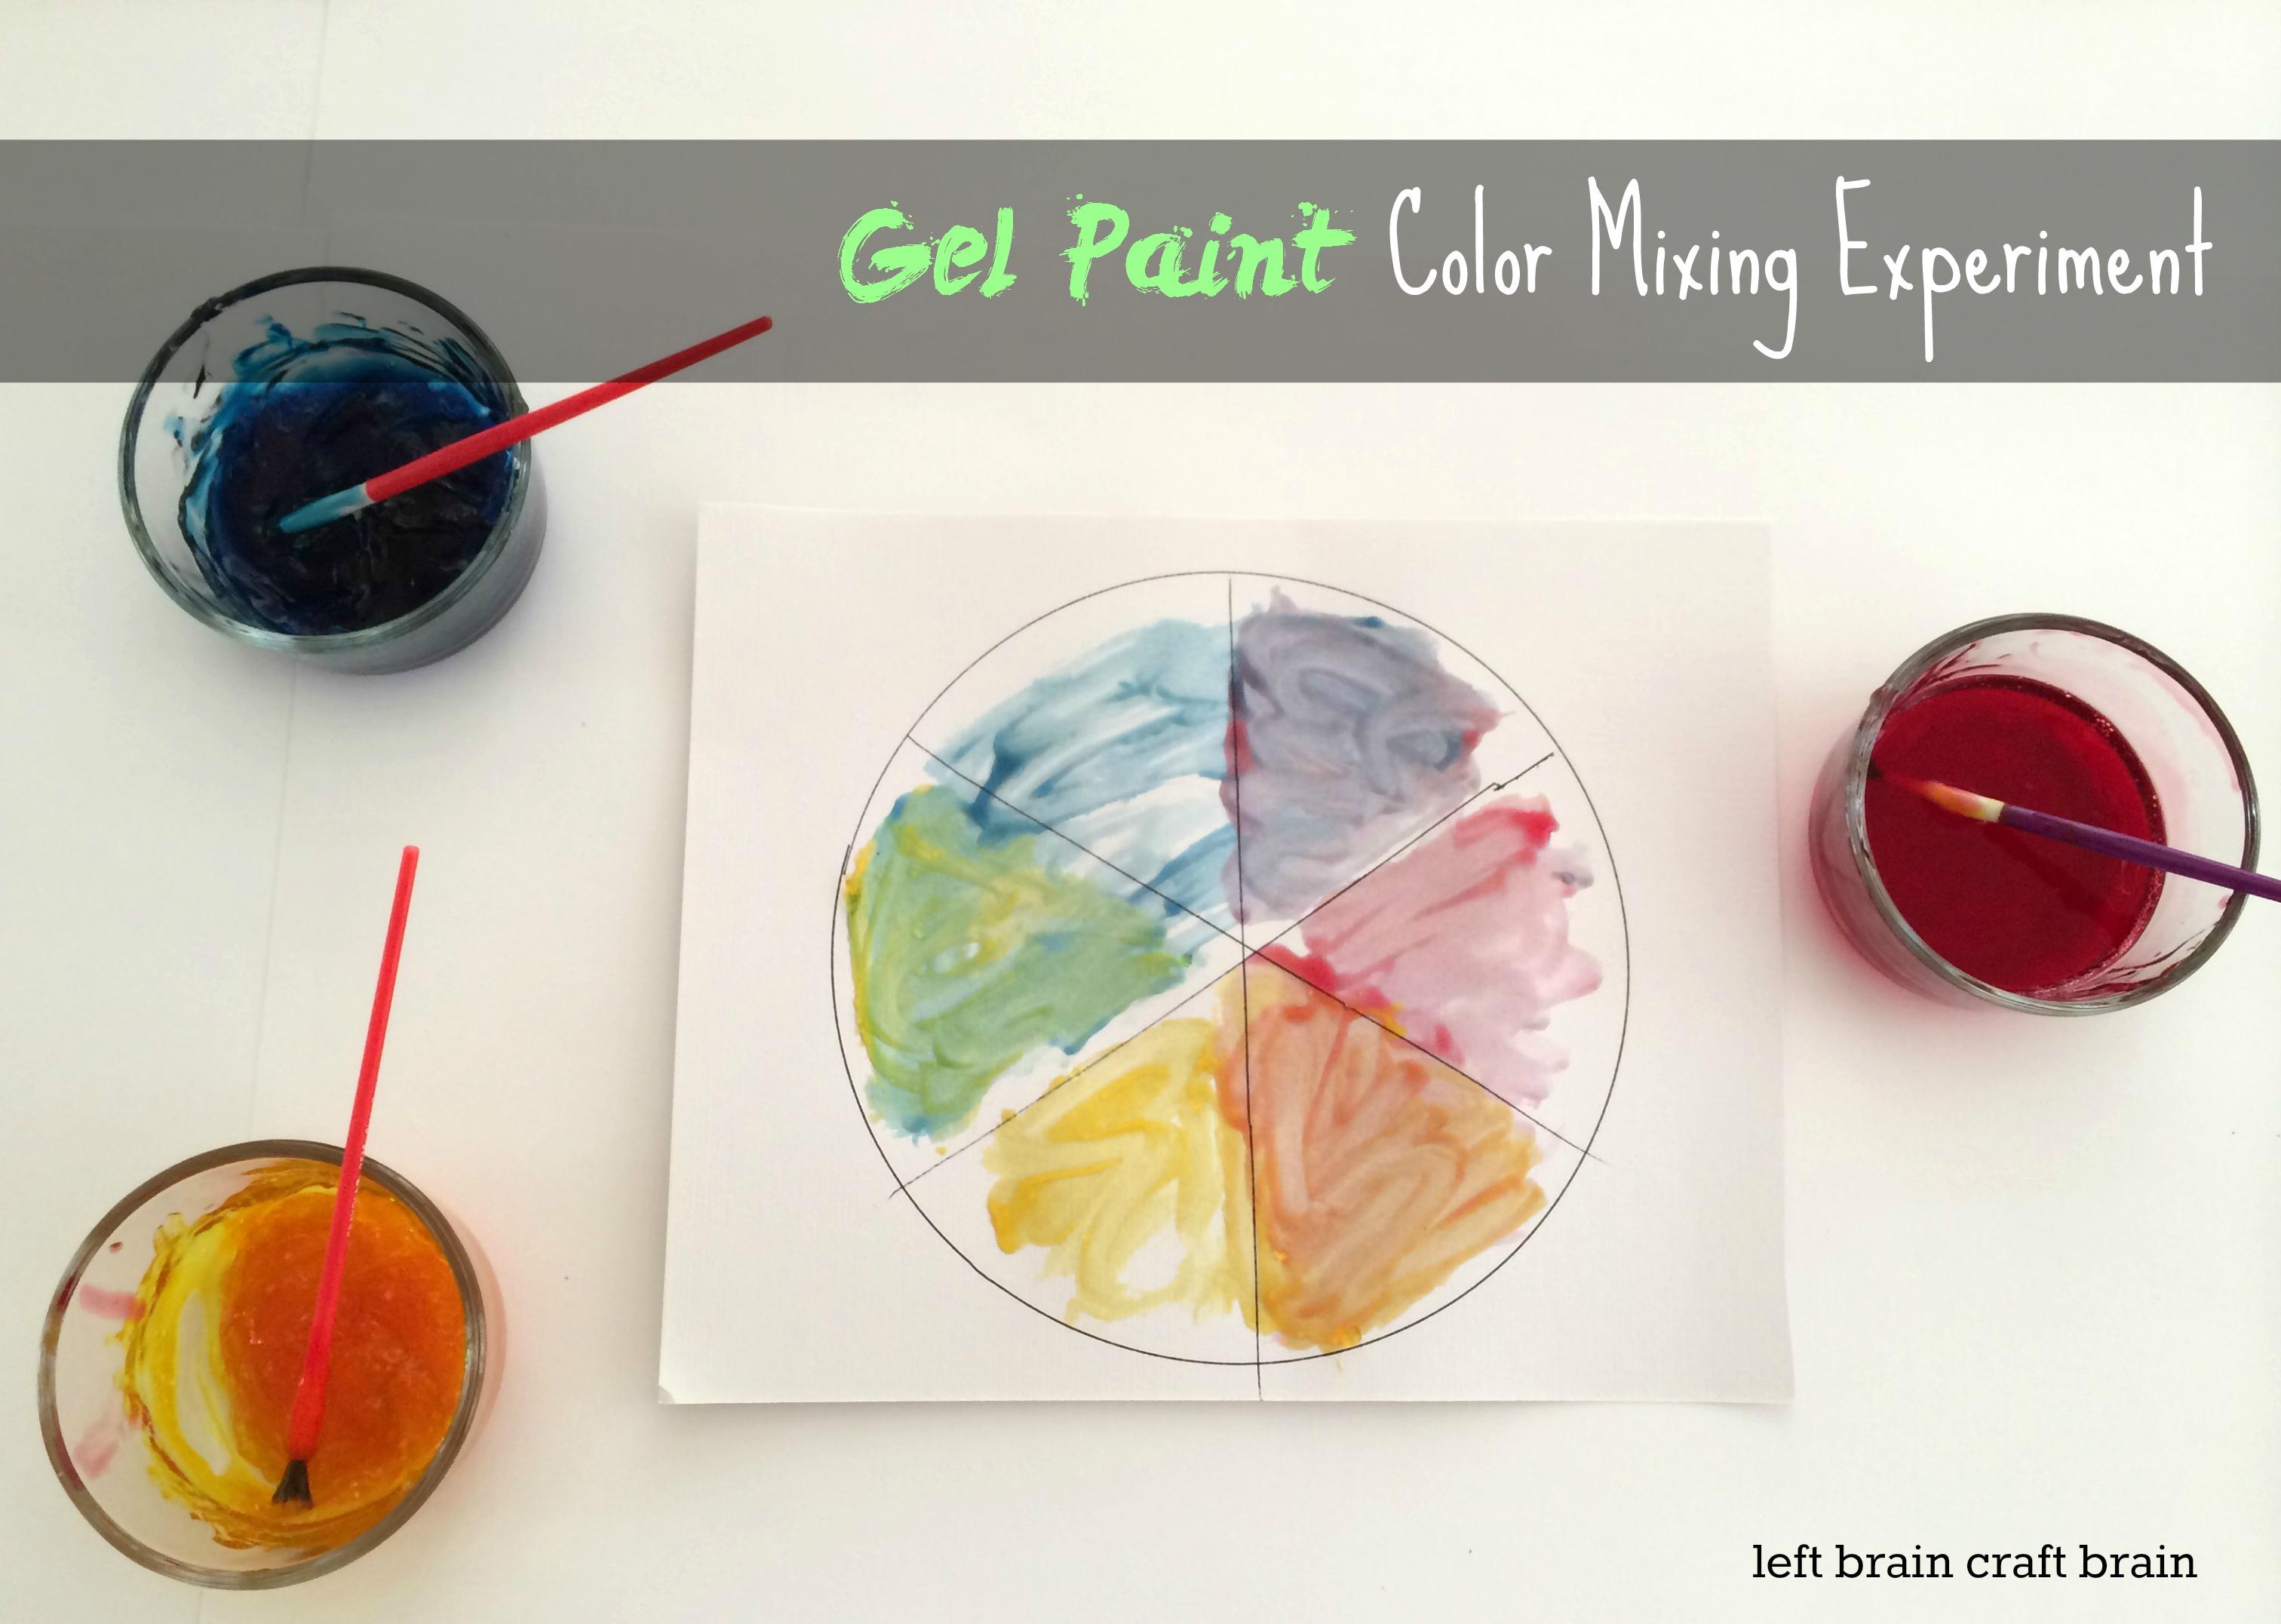 gel paint color mixing experiment left brain craft brain